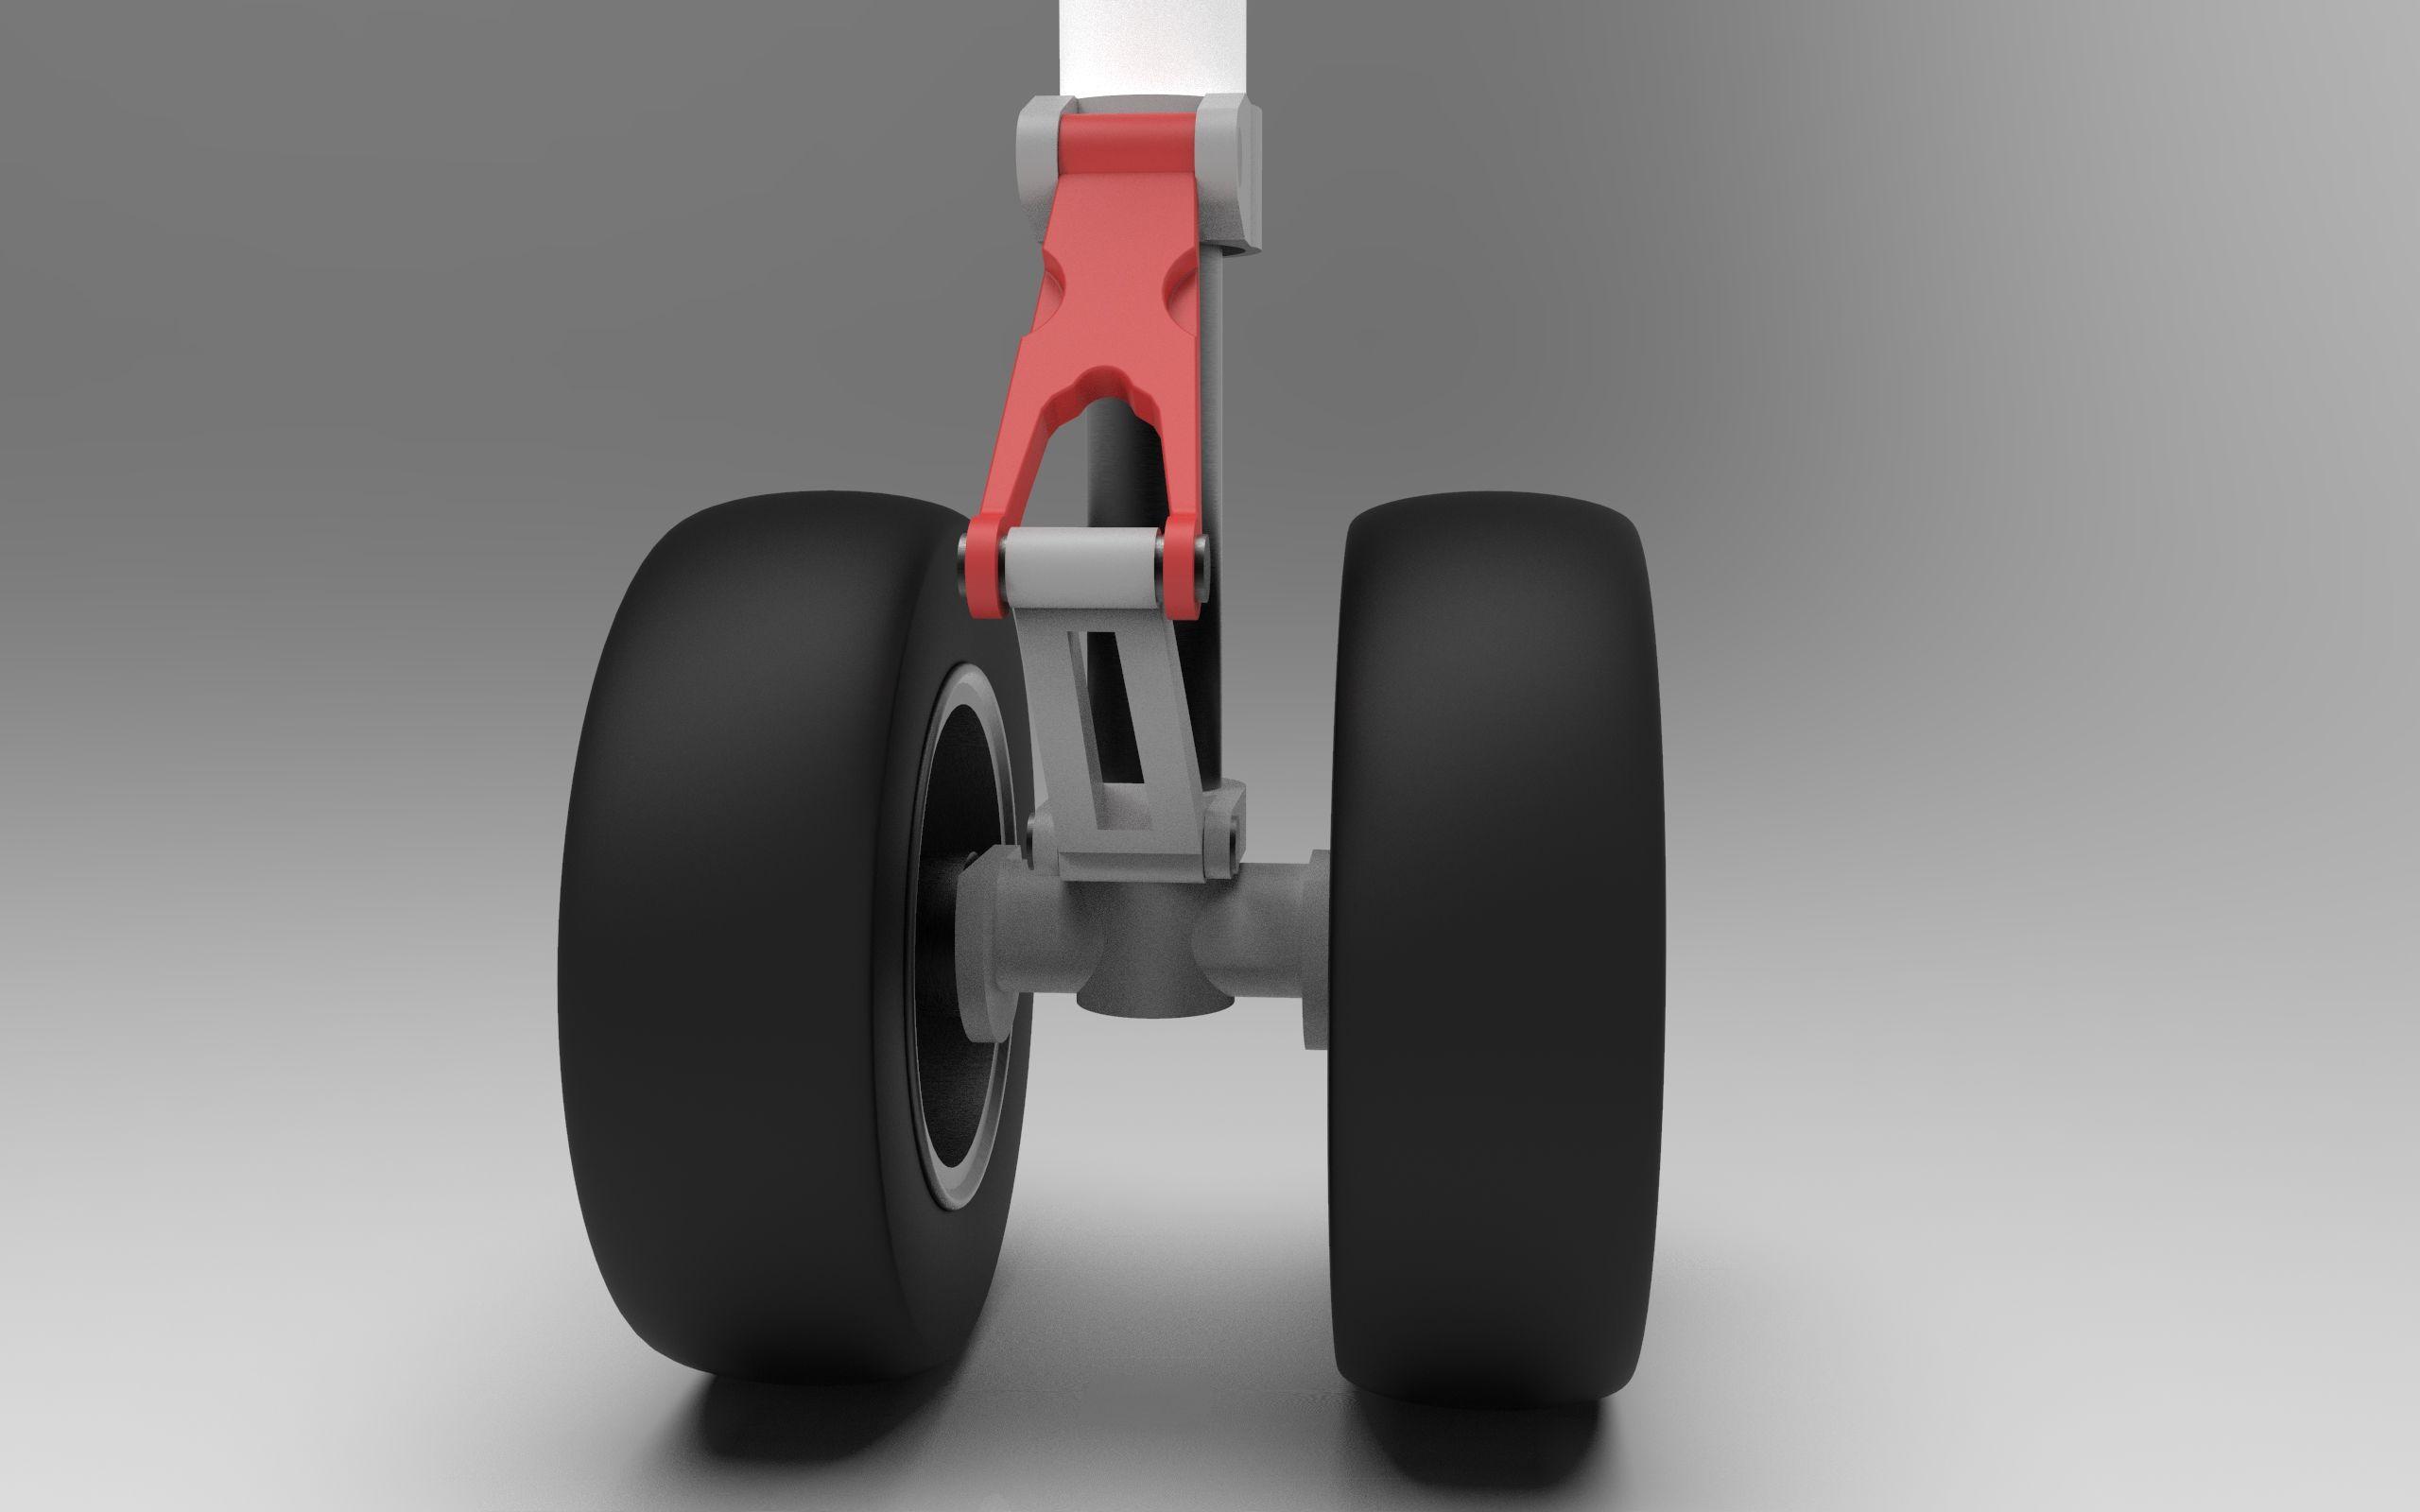 Aerodesign-550421-3500-3500